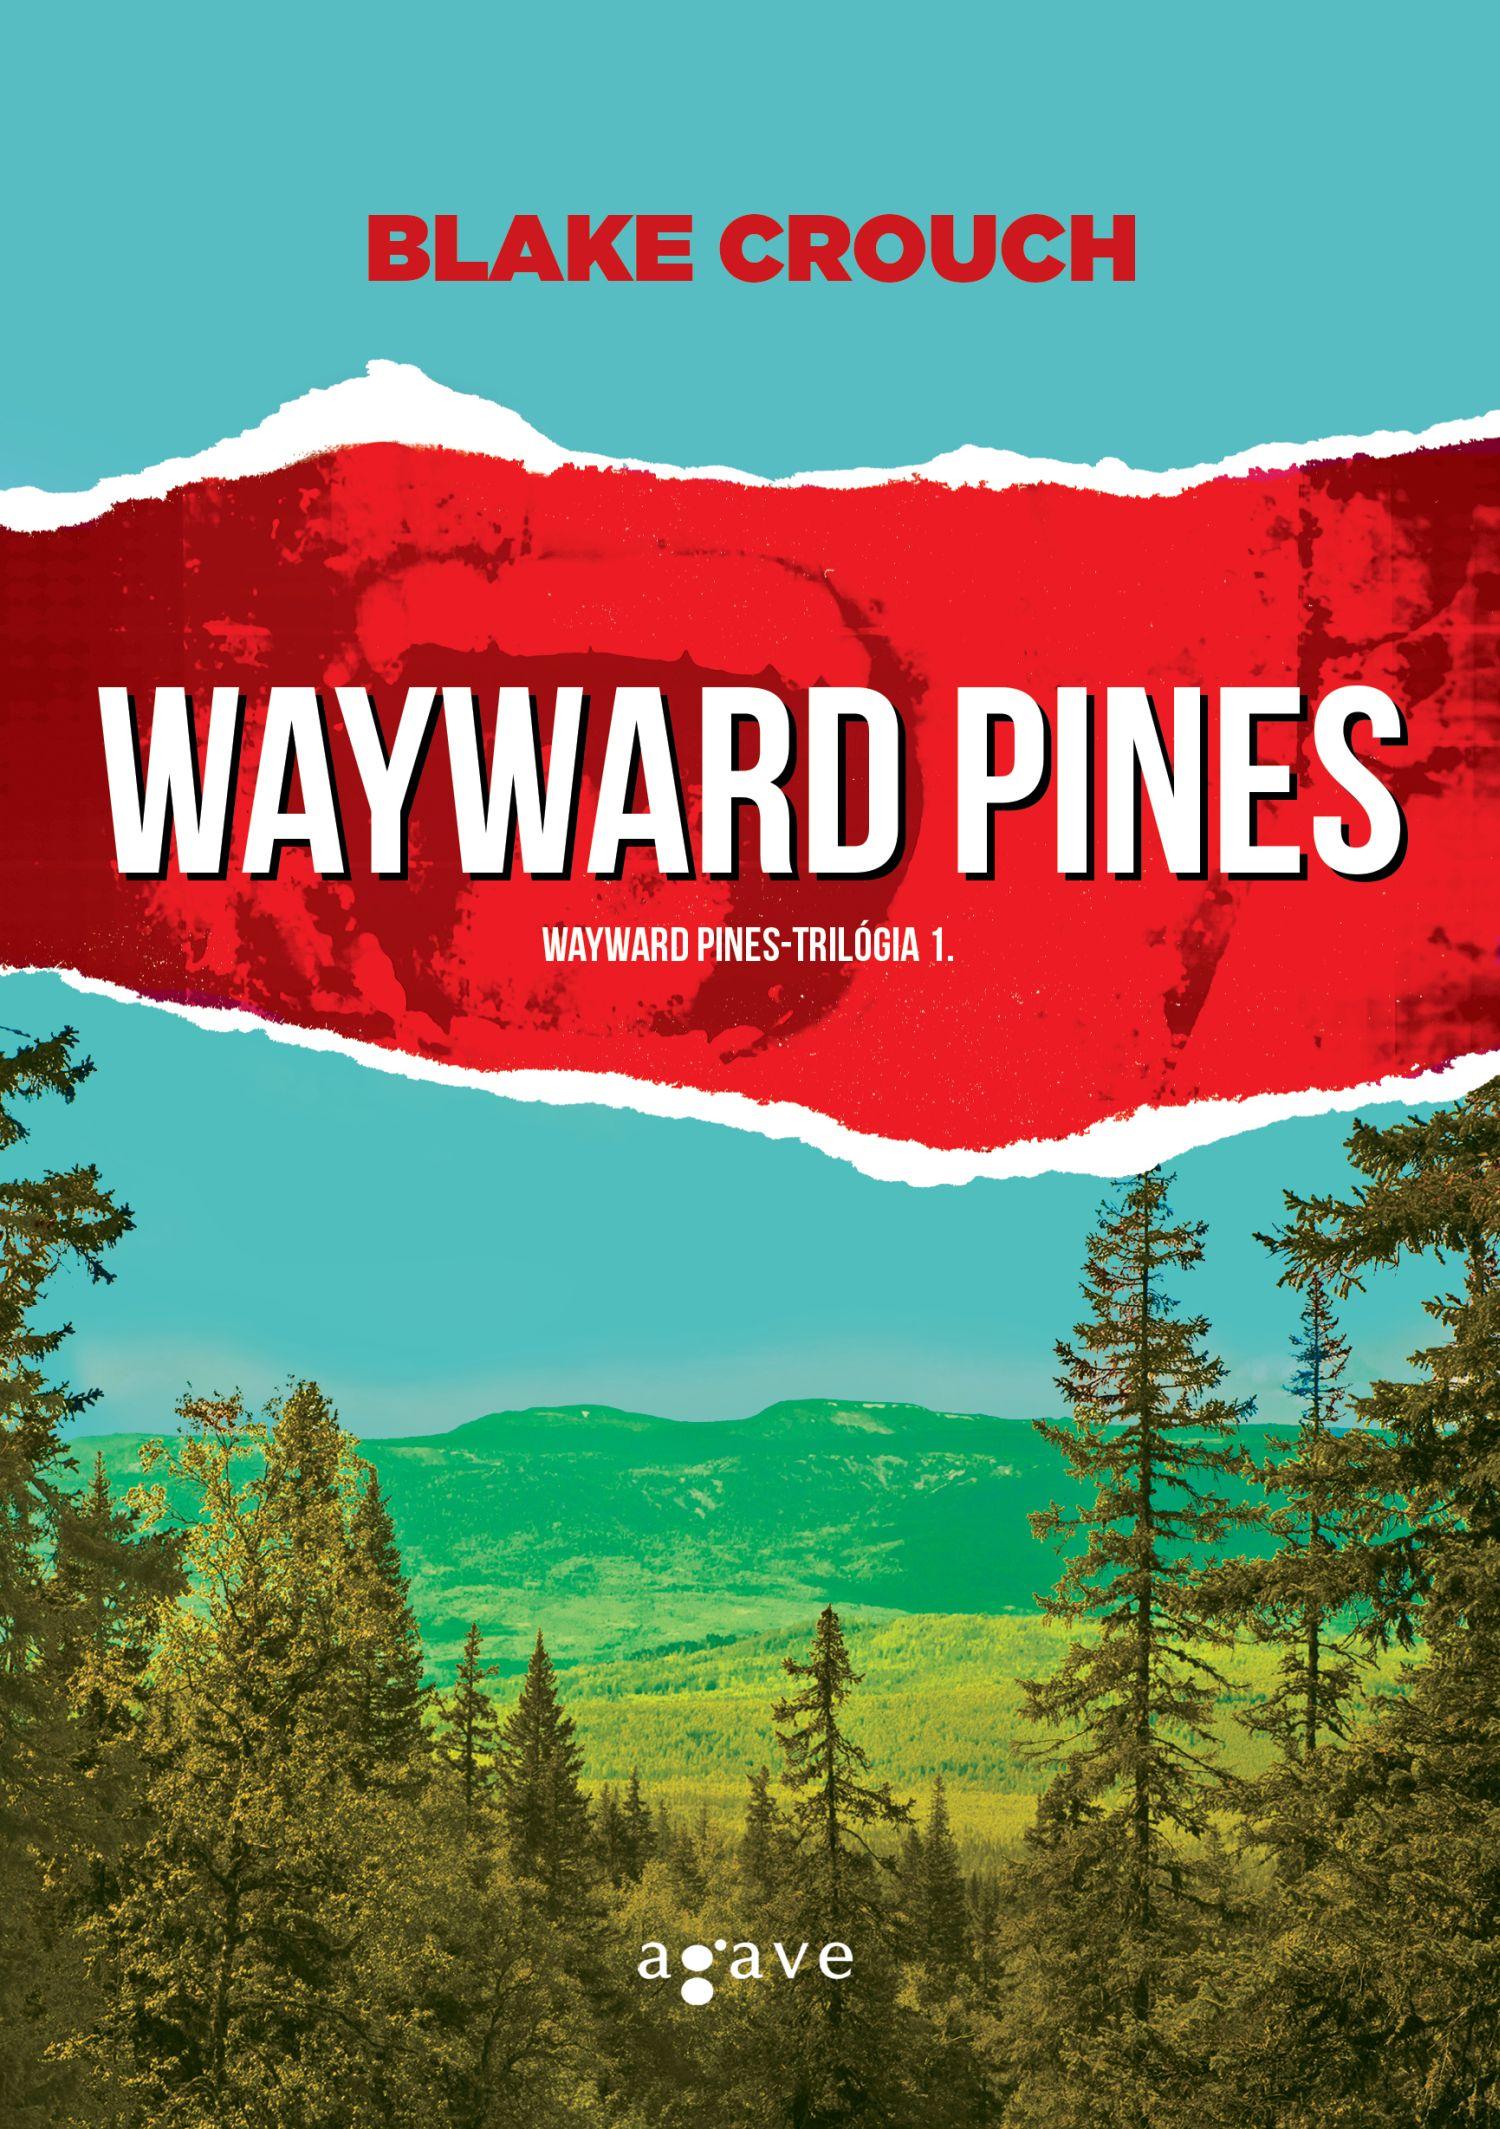 Blake_Crouch_Wayward-Pines